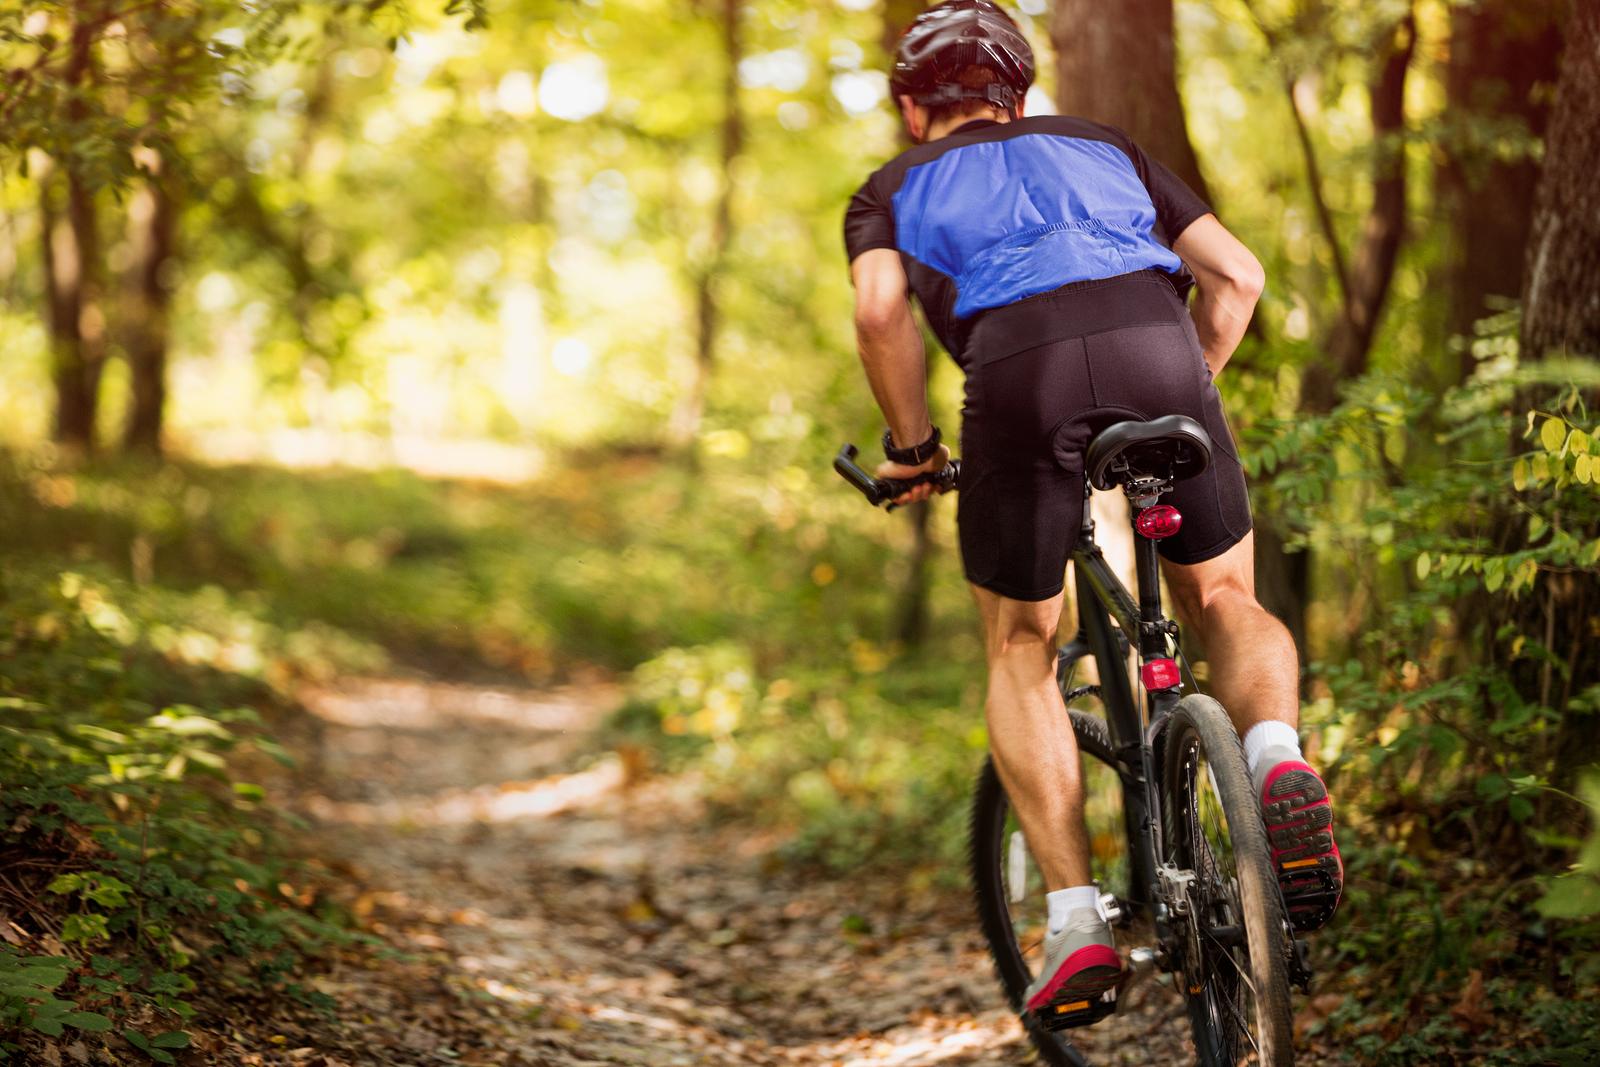 Chiropractic For Hiking And Biking